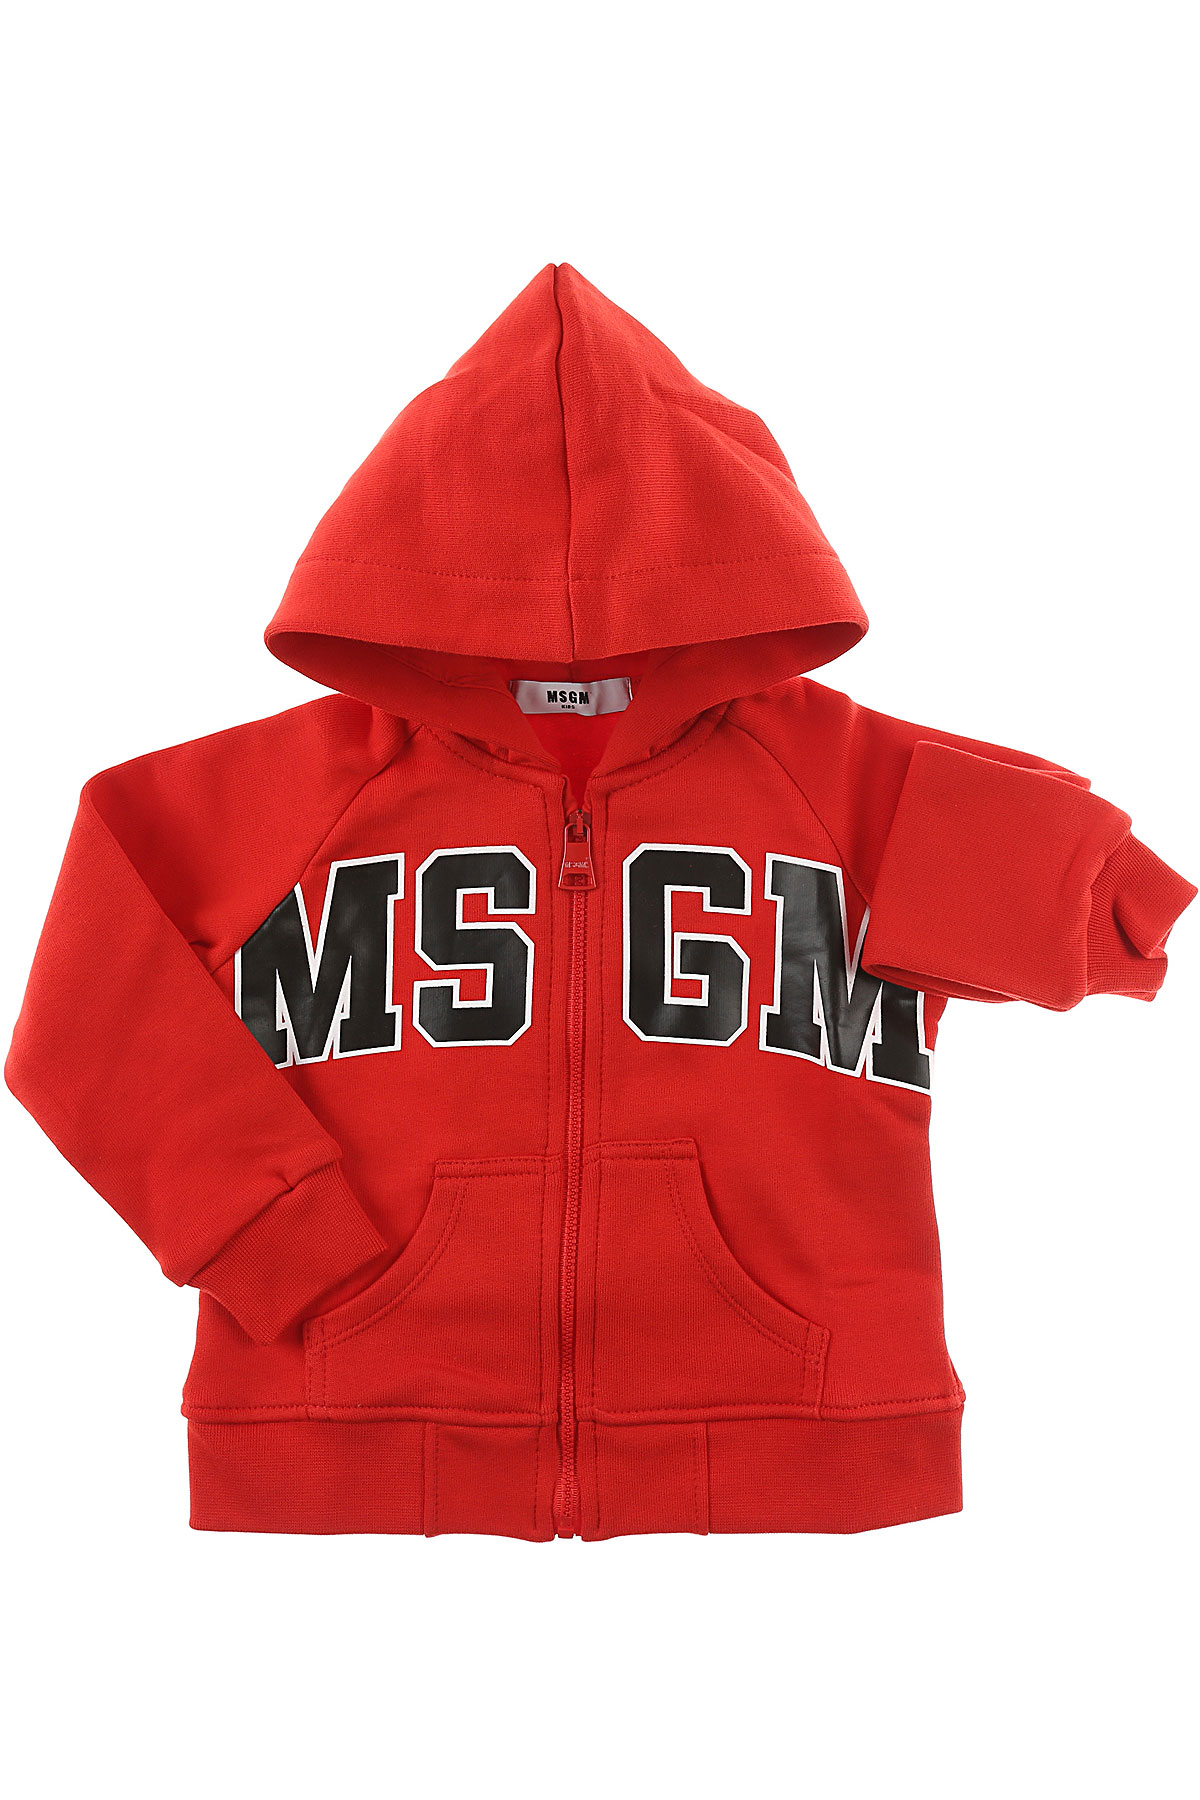 Image of MSGM Baby Sweatshirts & Hoodies for Boys, Red, Cotton, 2017, 12M 18M 6M 9M